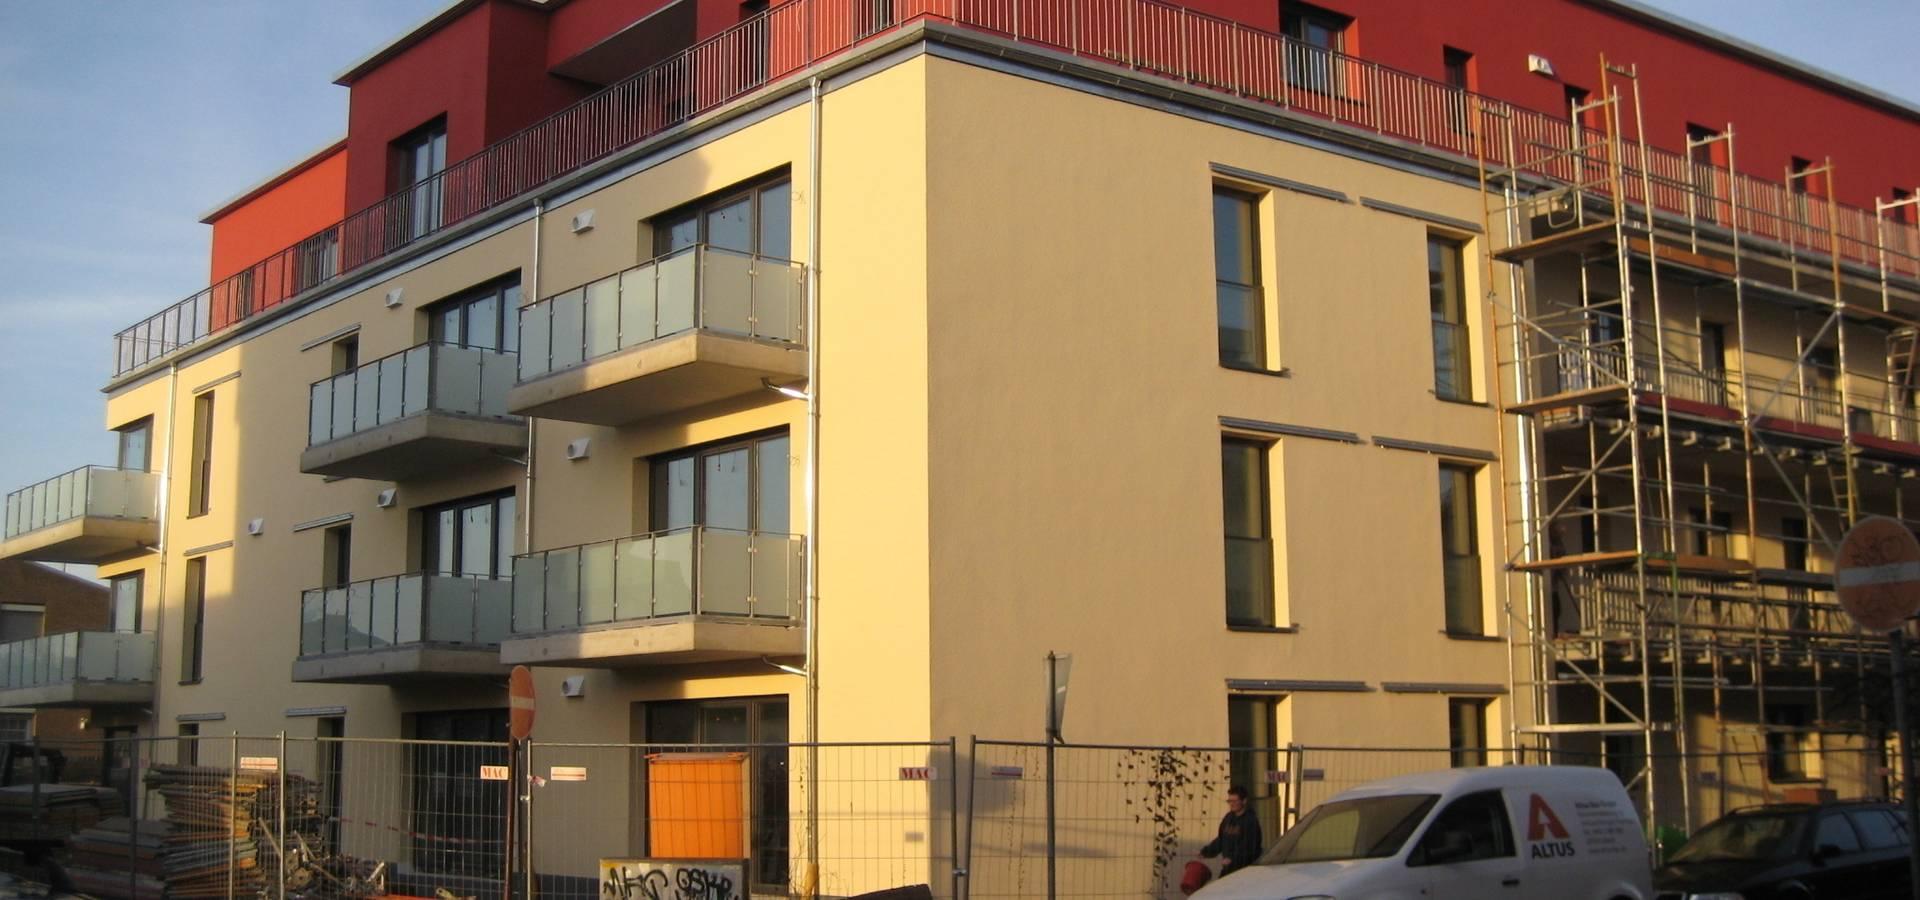 Solarc Architekten